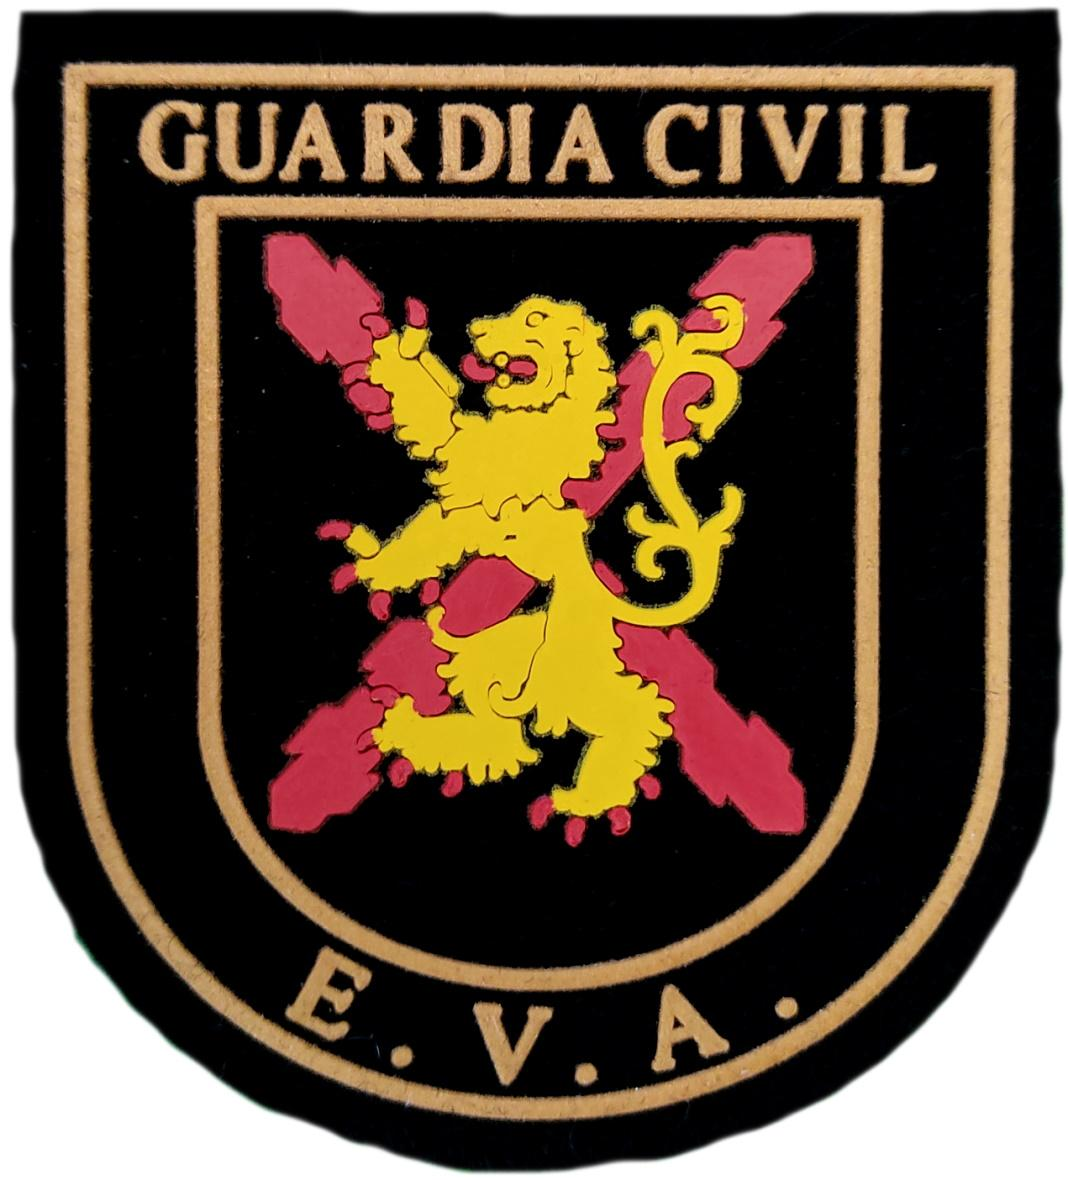 Guardia Civil EVA Escuadrón de Vigilancia Aeroportuaria parche insignia emblema distintivo